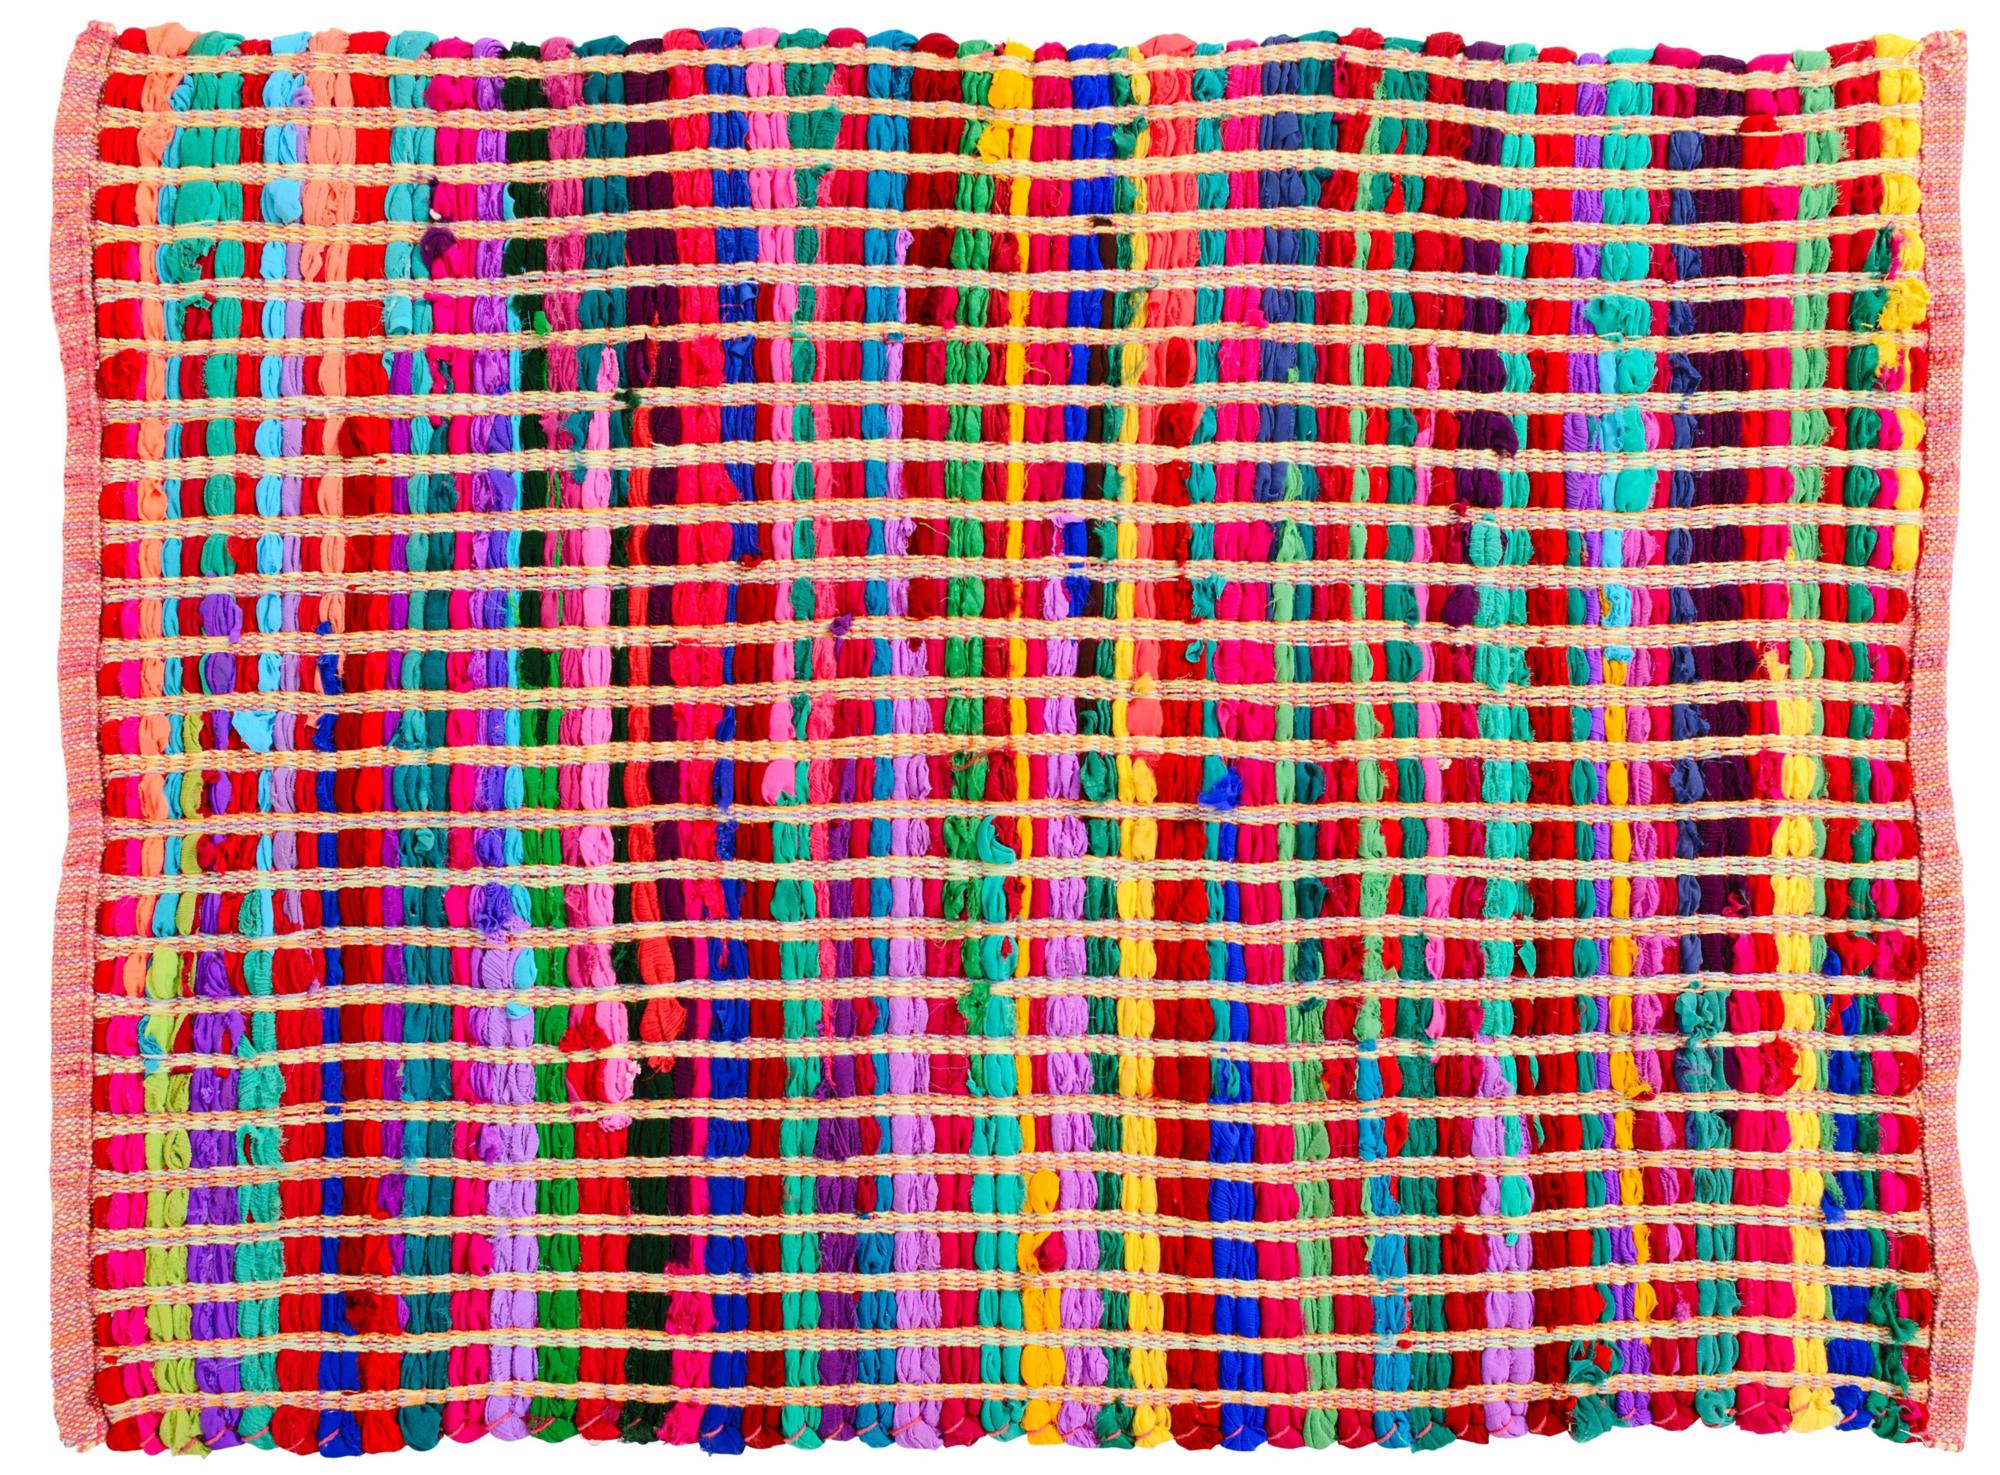 Tapis Tisse Main 60x85 Multicolore Tapis Chambre Salon Tapis Textile Fly Tapis Chambre Tapis Tisse Tapis